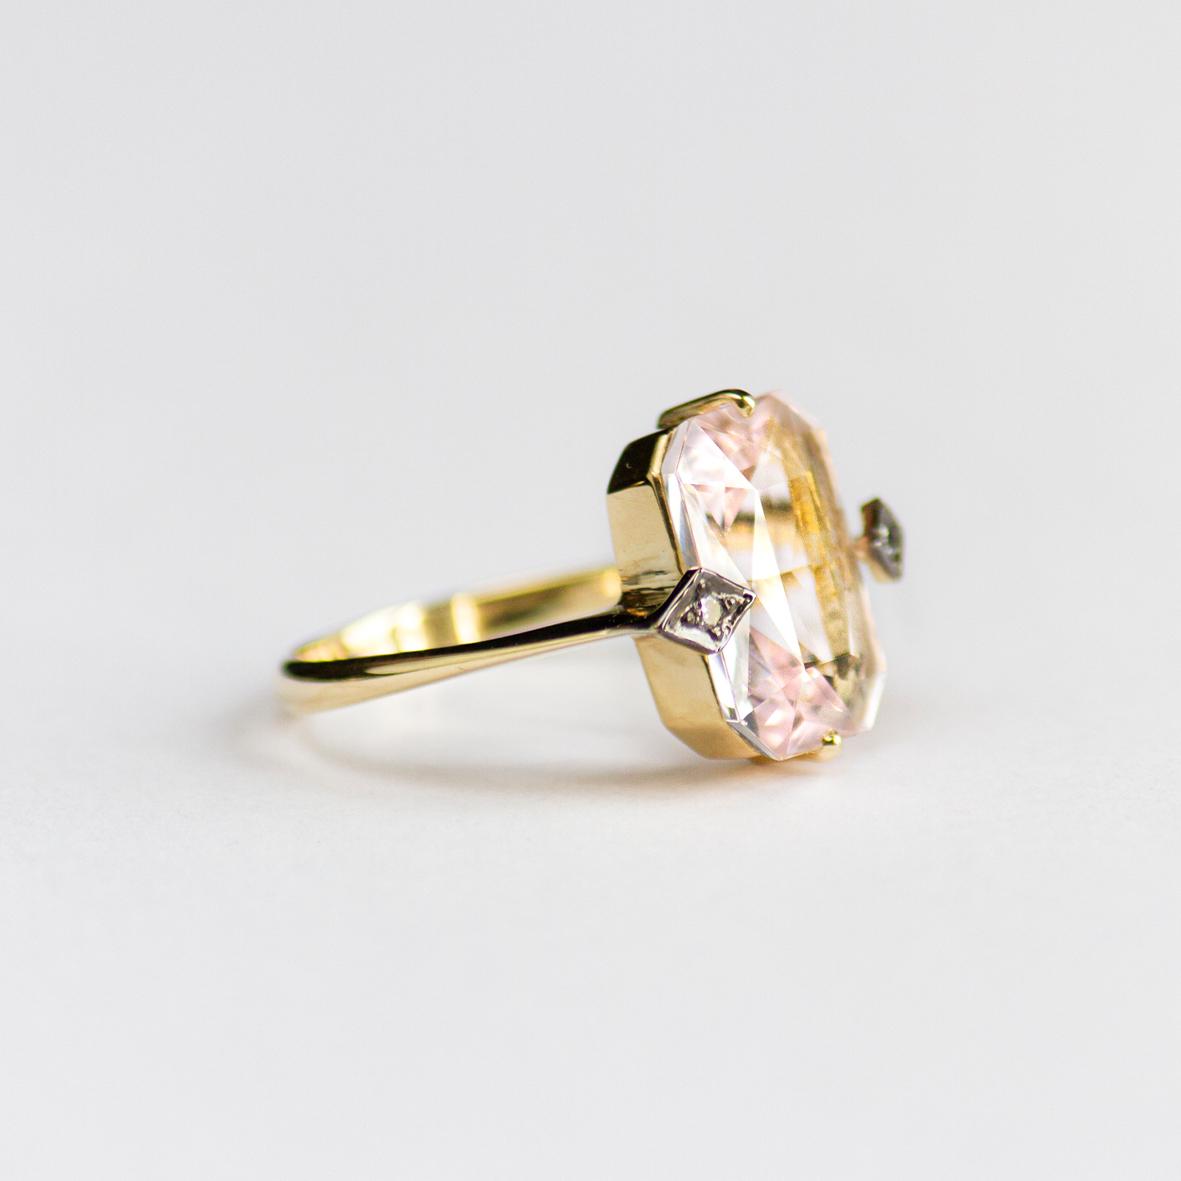 2. OONA_gems of ceylon_ficha3_morganite ring